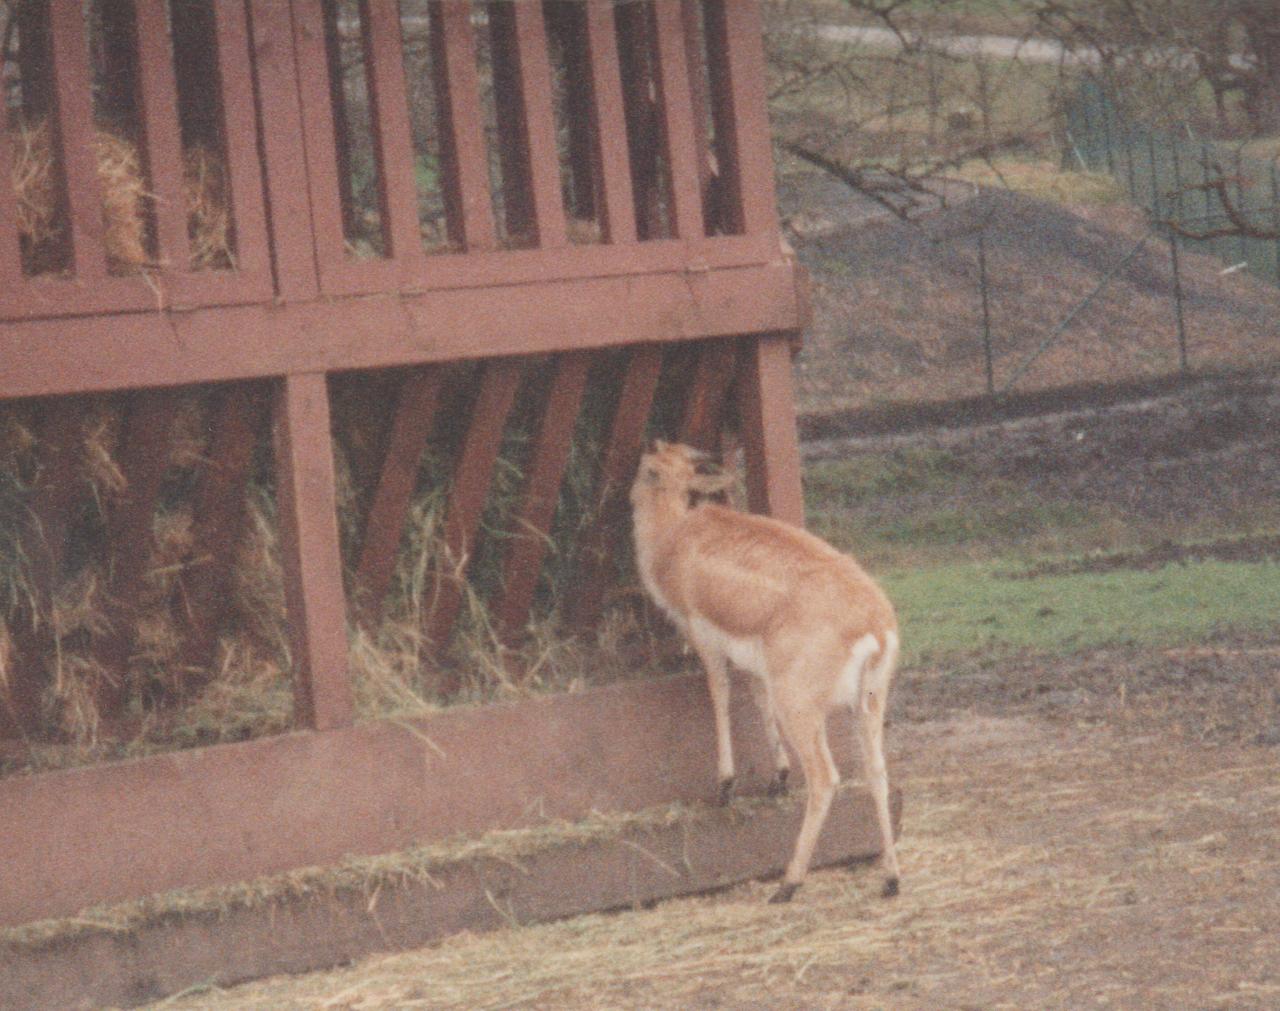 1992-12-26 - Saturday - Wildlife Safari Trip, Marilyn, Crystal-12.png